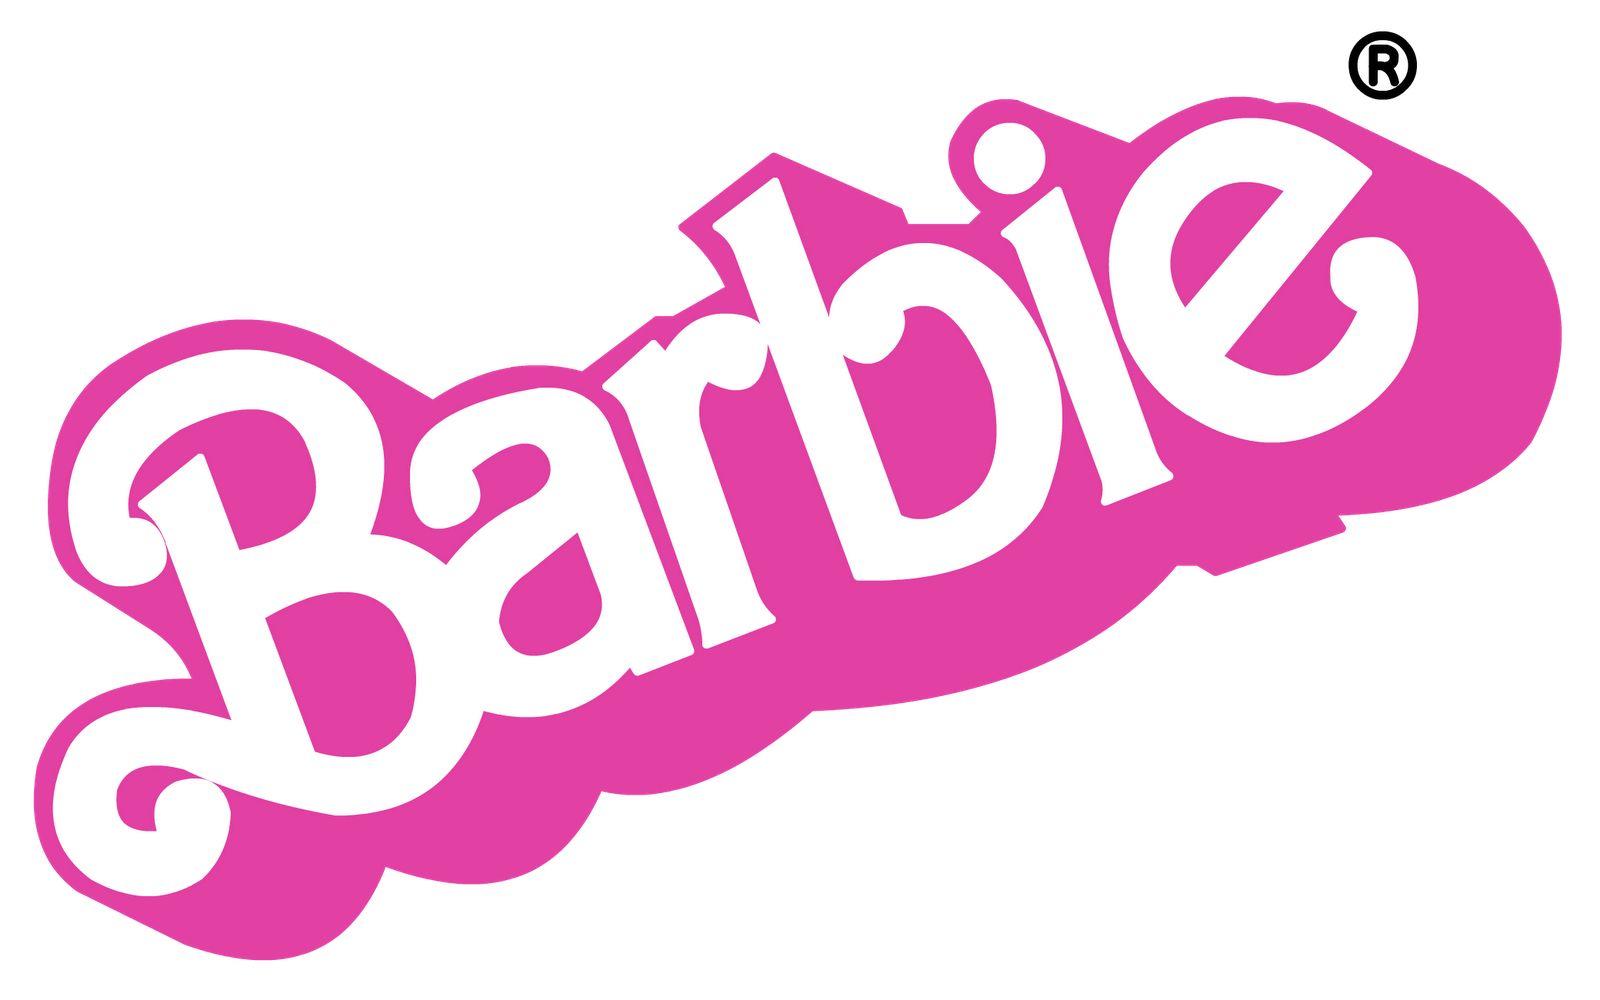 barbie logo 1975 1990 barbie pinterest birthdays rh pinterest co uk ken barbie logo font mattel barbie logo font